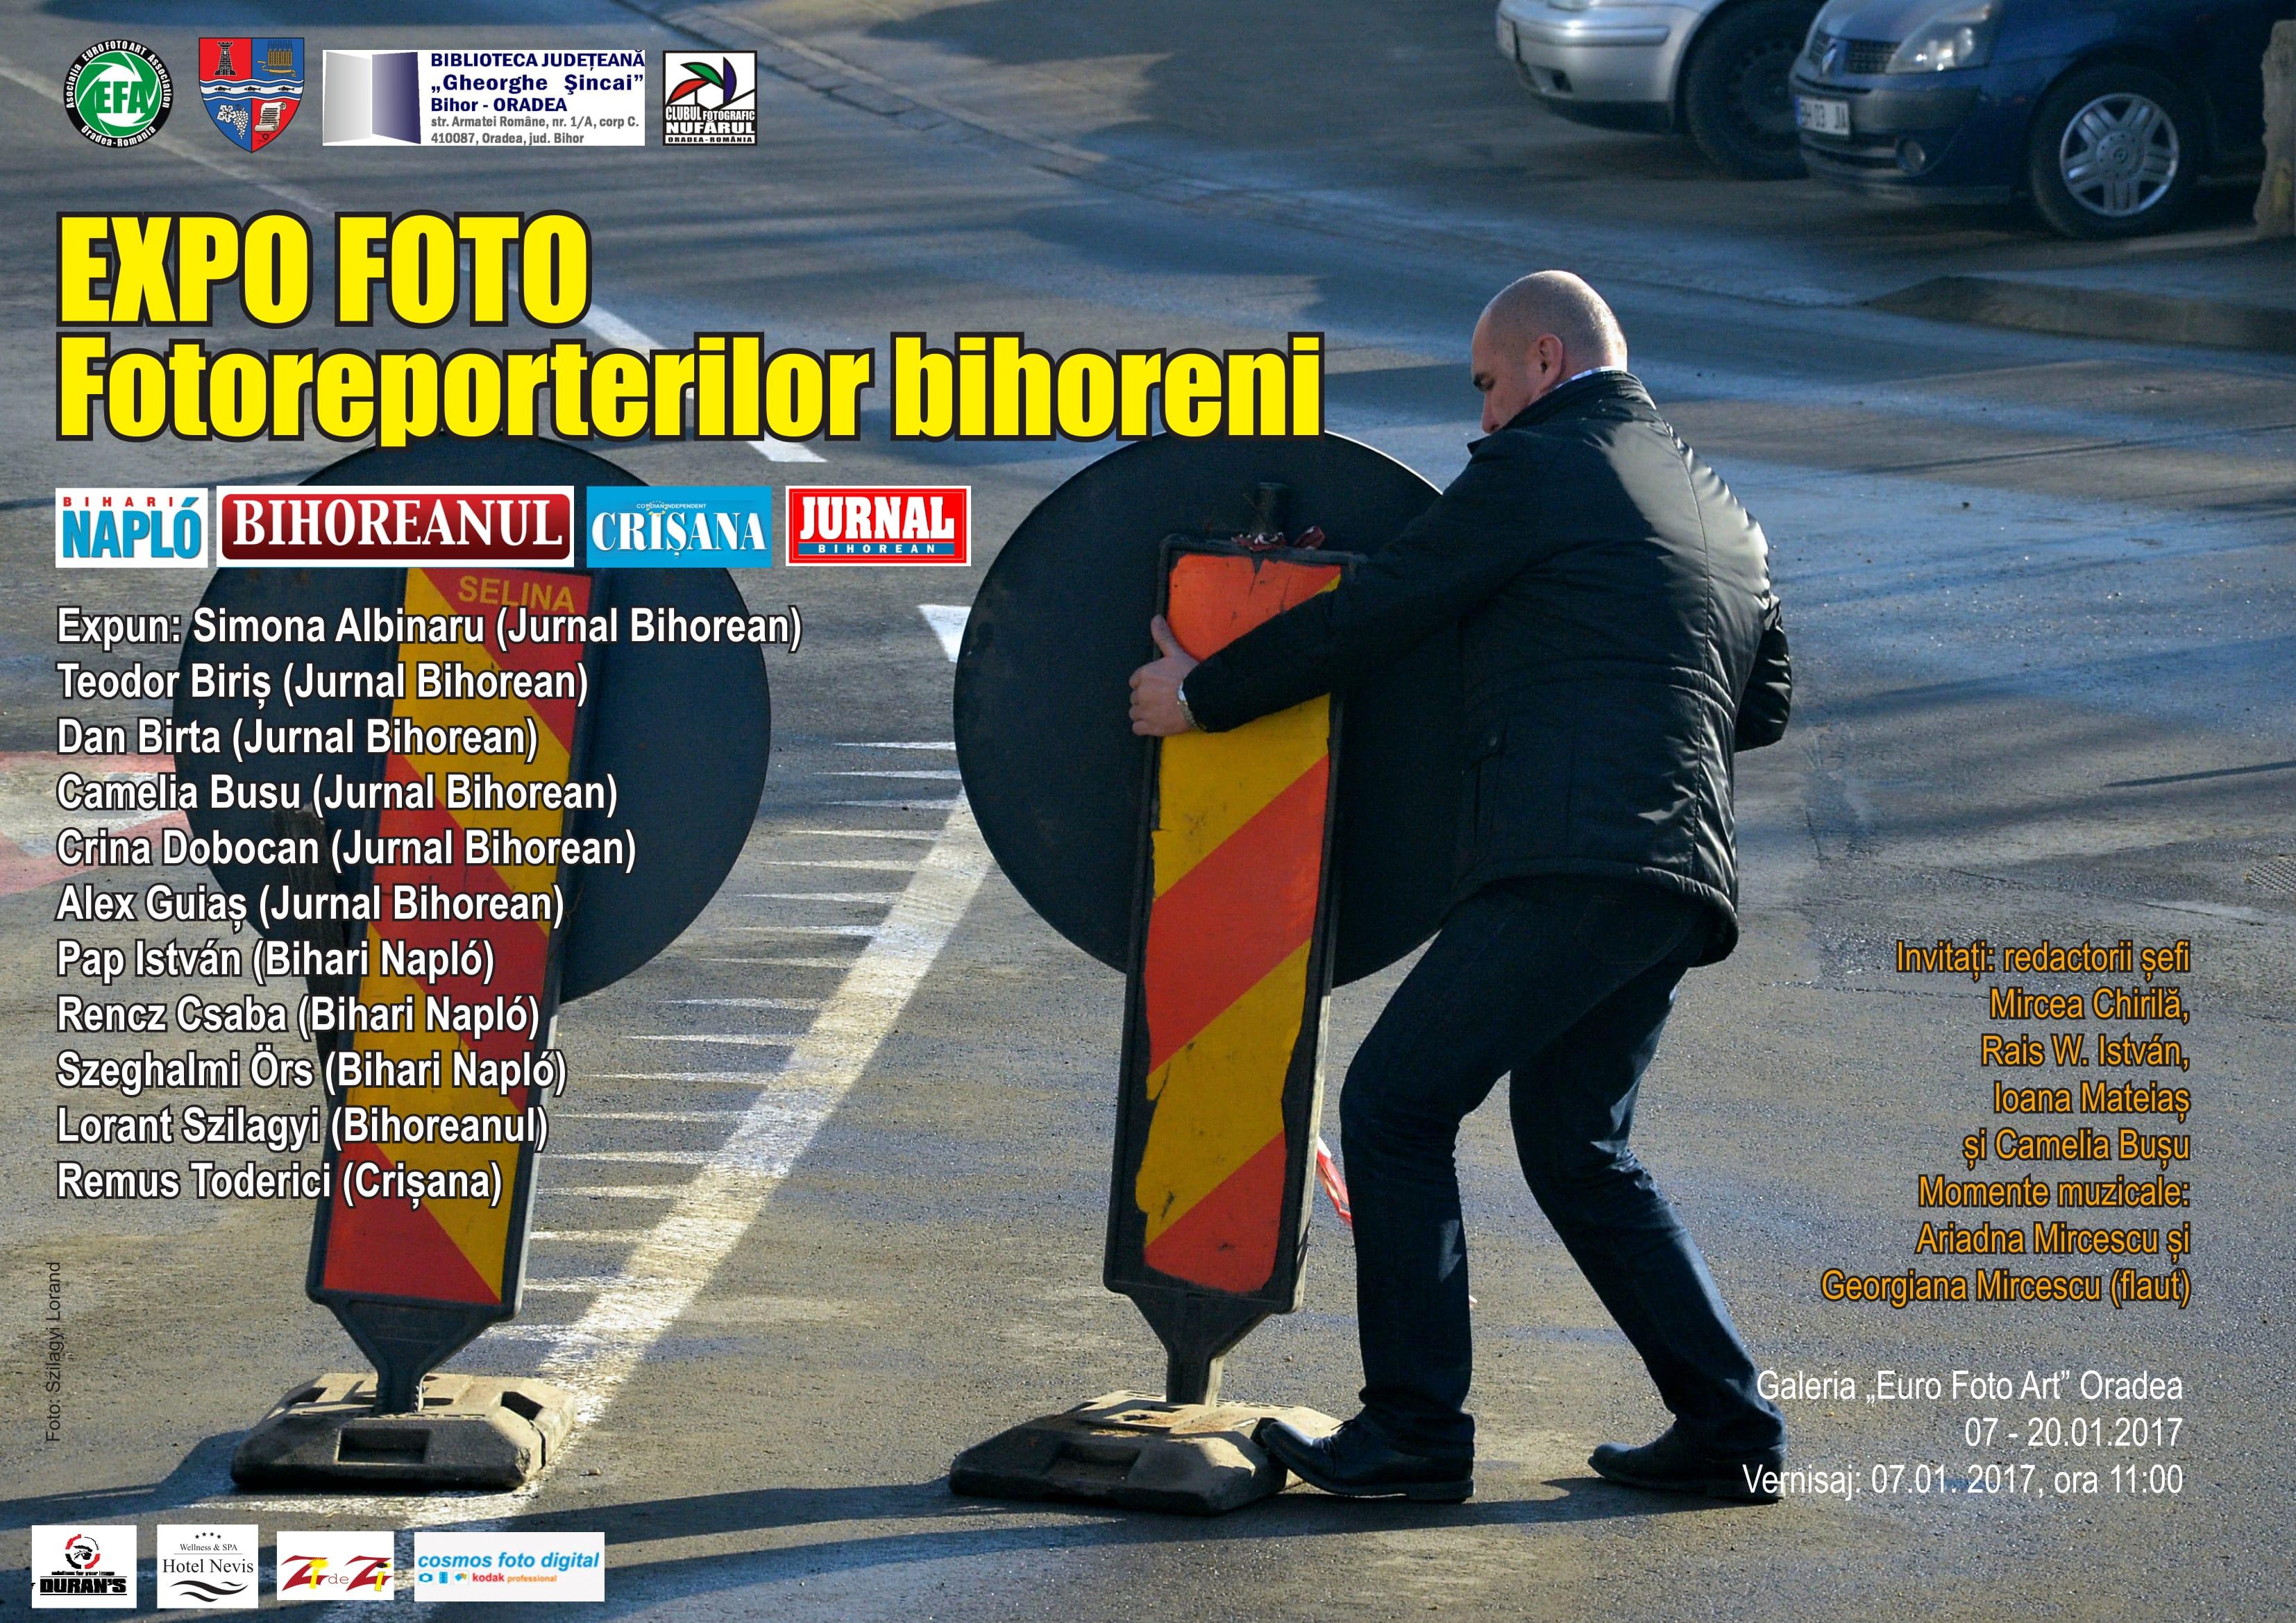 afi_expo_fotoreporteri_bihoreni_print-1.jpg